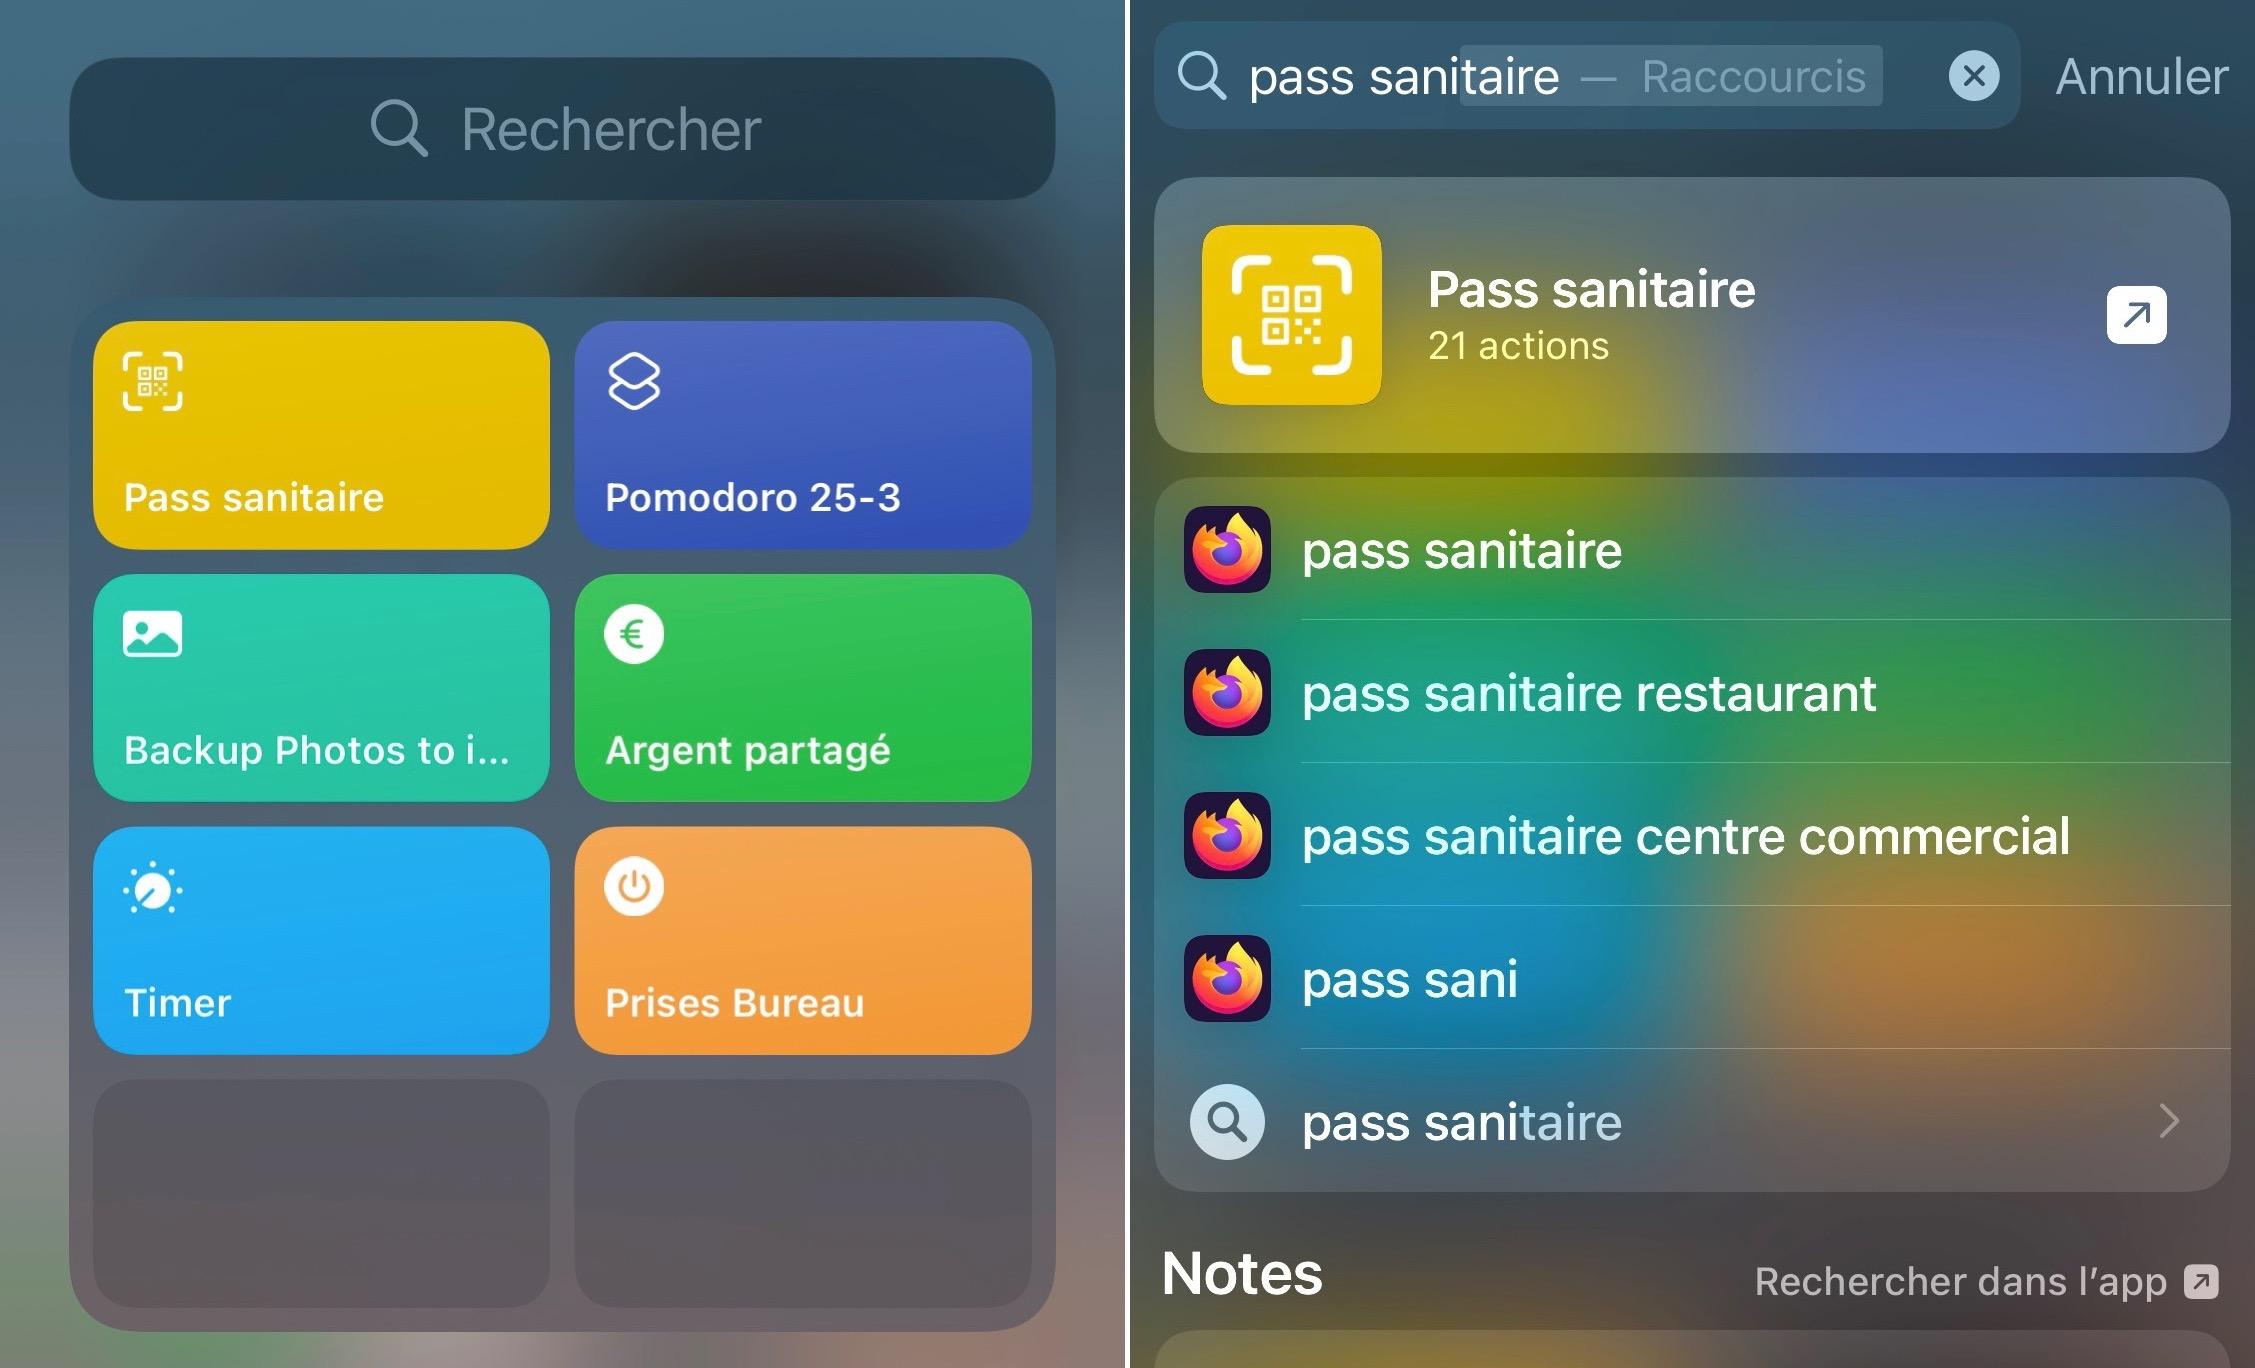 Raccourci iOS pass sanitaire